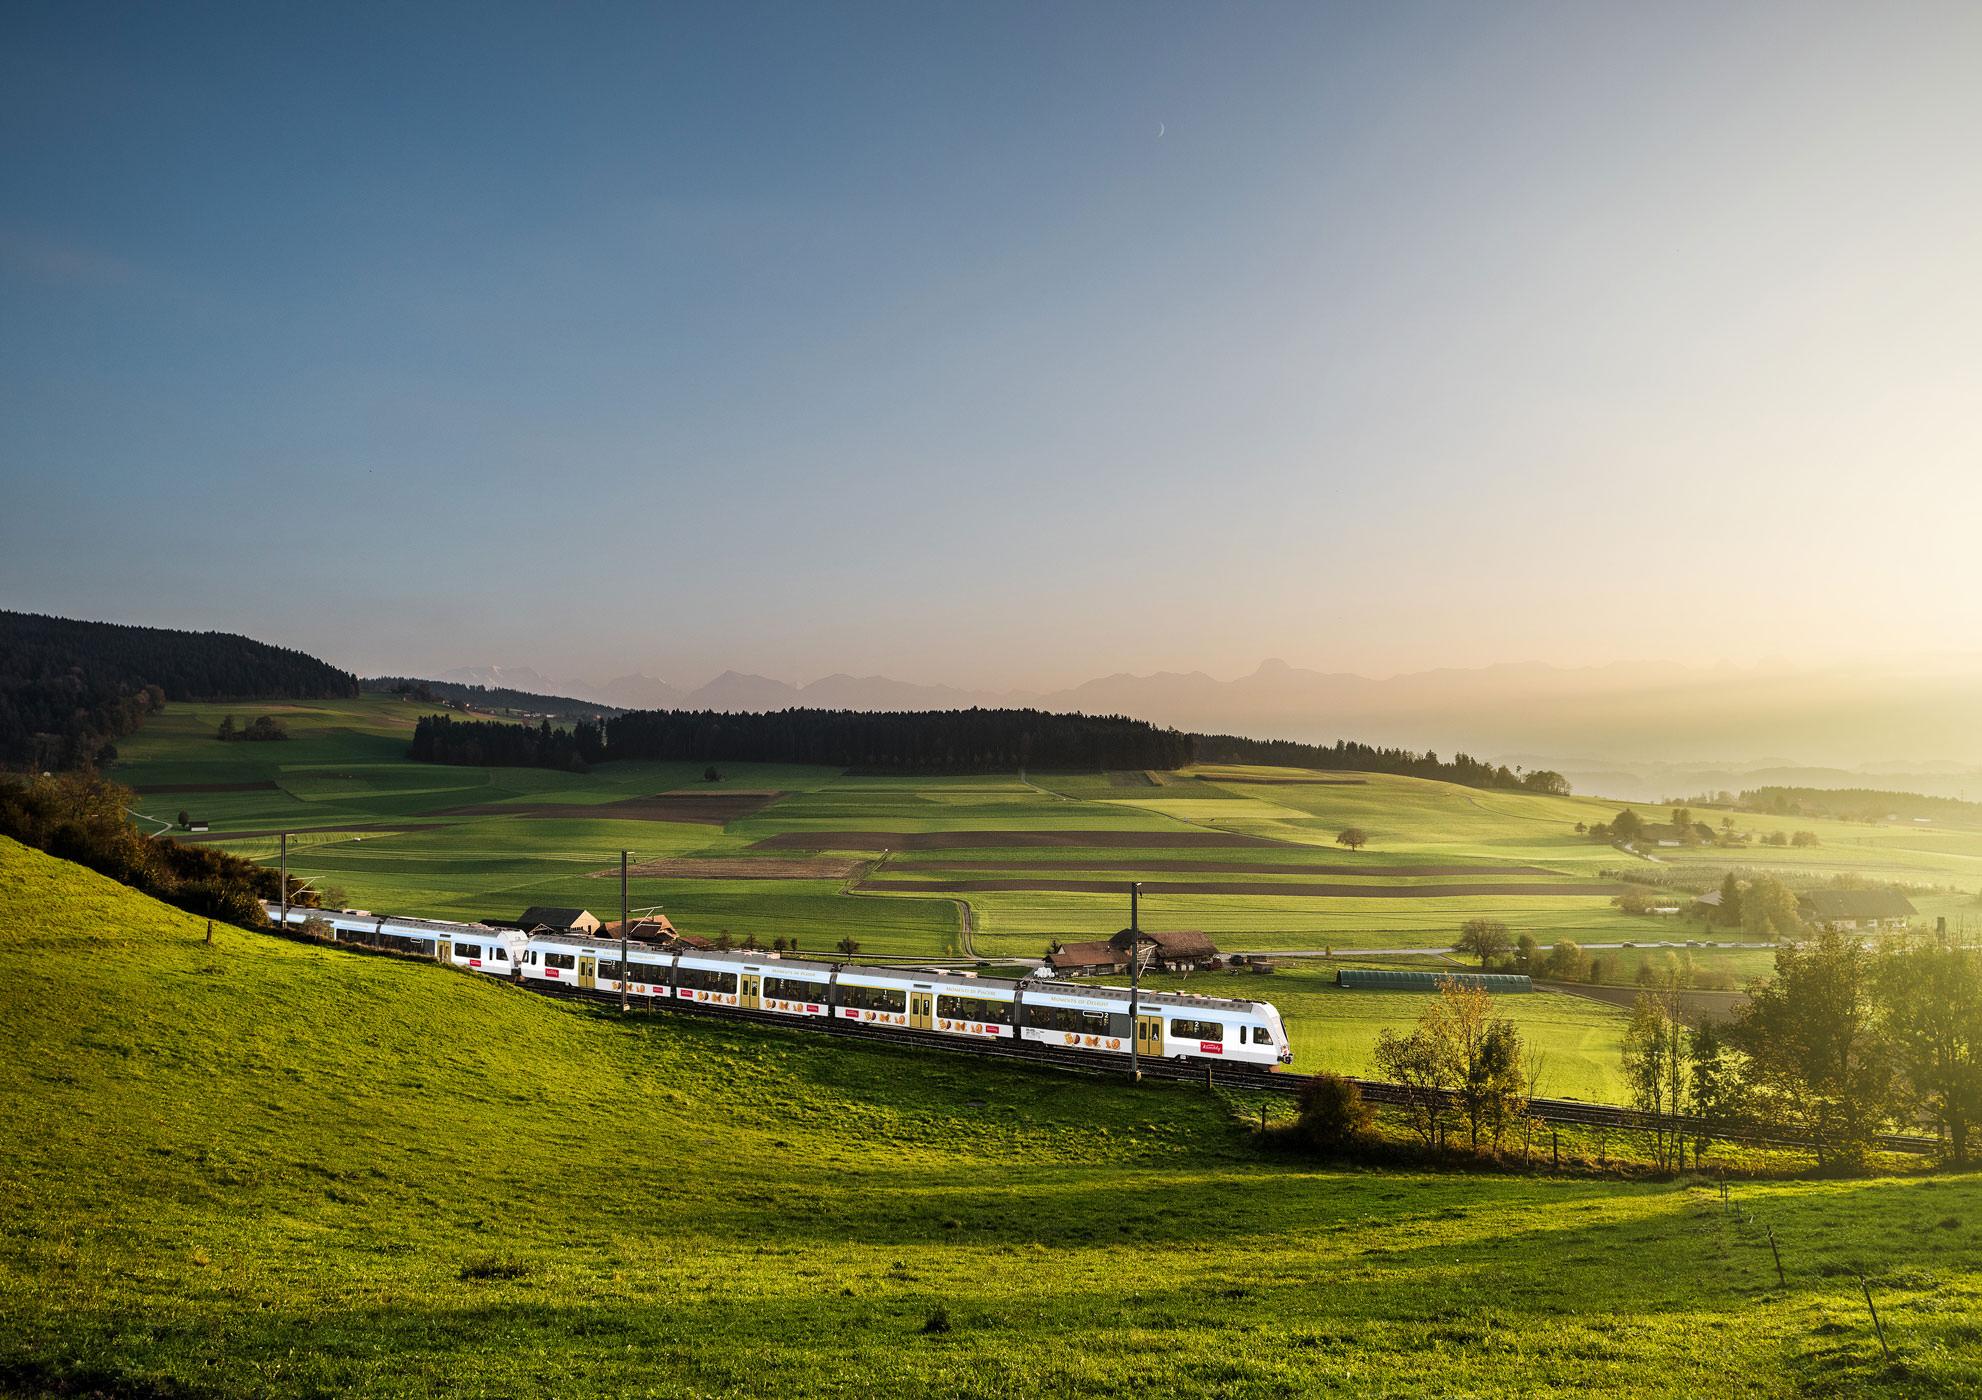 kambly-im-Kambly-Zug-unterwegs